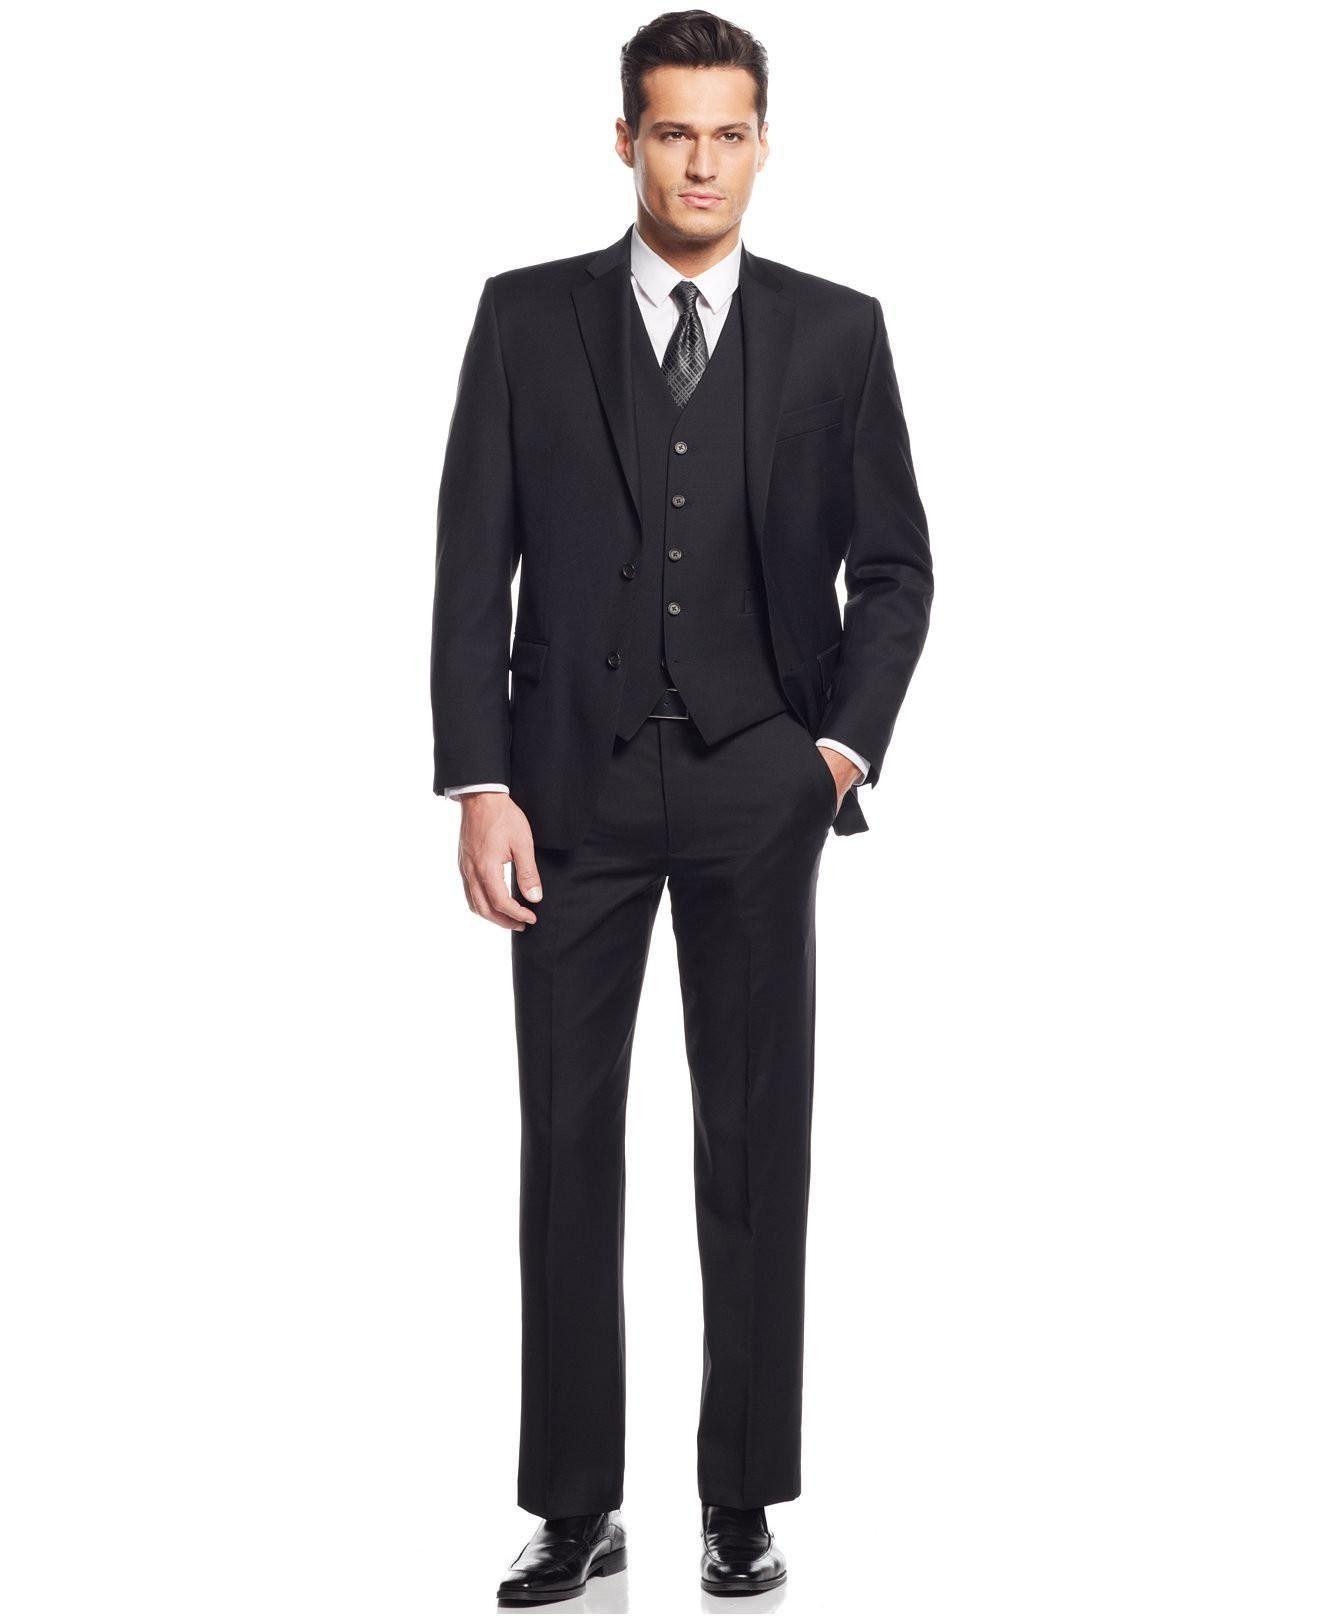 Custom Made 2018 New Groom Tuxedos Wedding Groomsman Suit Groomsman Bridegroom Suits Jacket+Pants+Vest Formal Prom Party Suits For Men